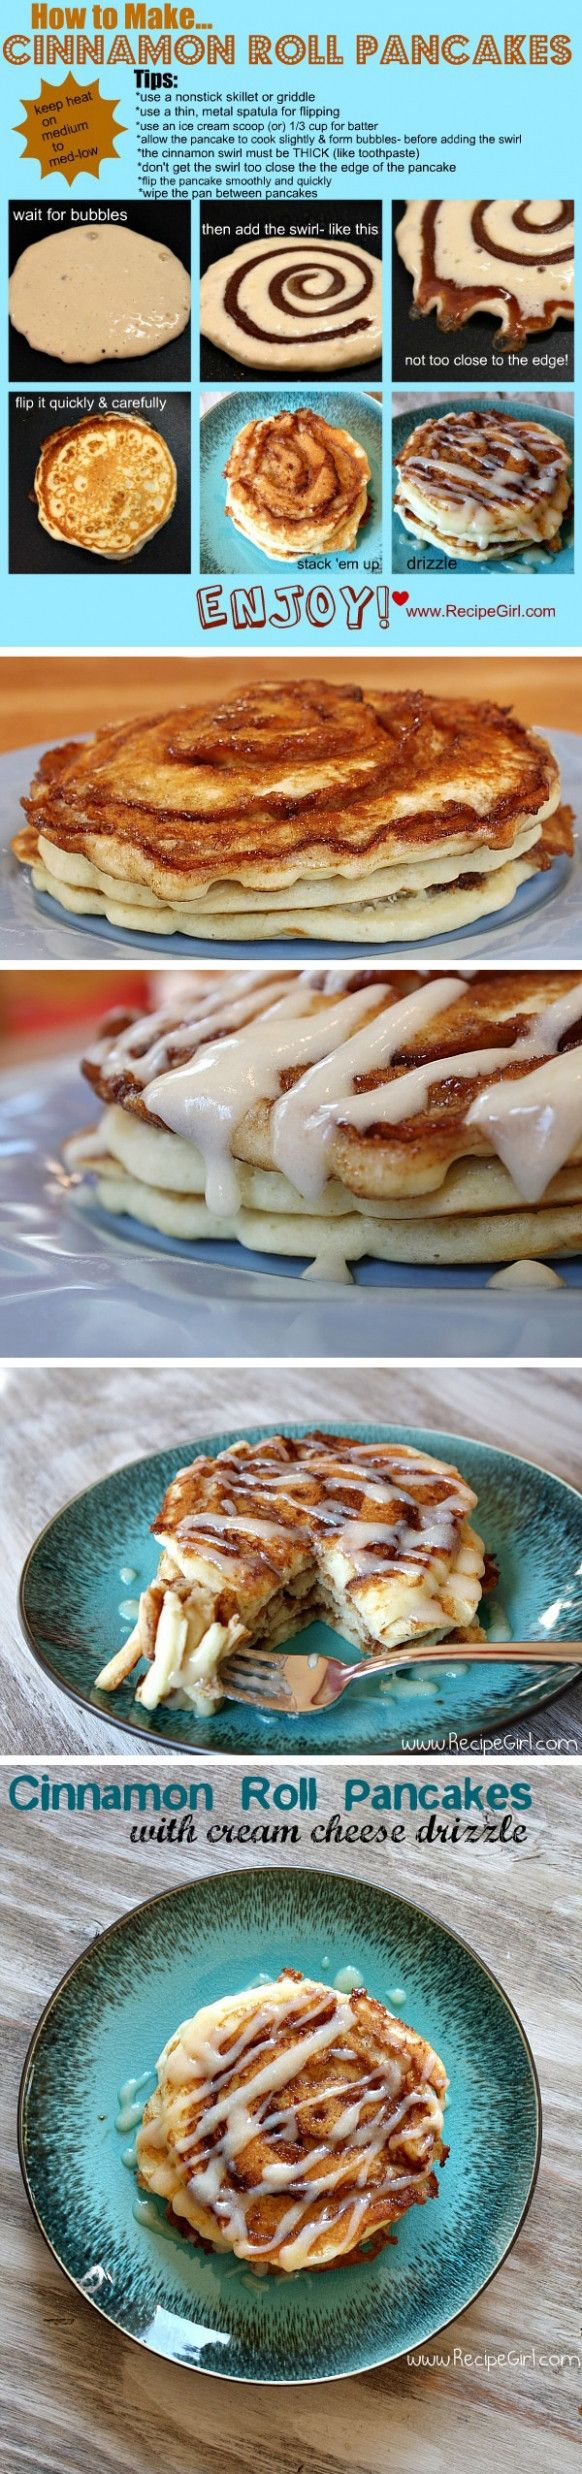 Cinnamon Roll Pancakes Birthday breakfasts?